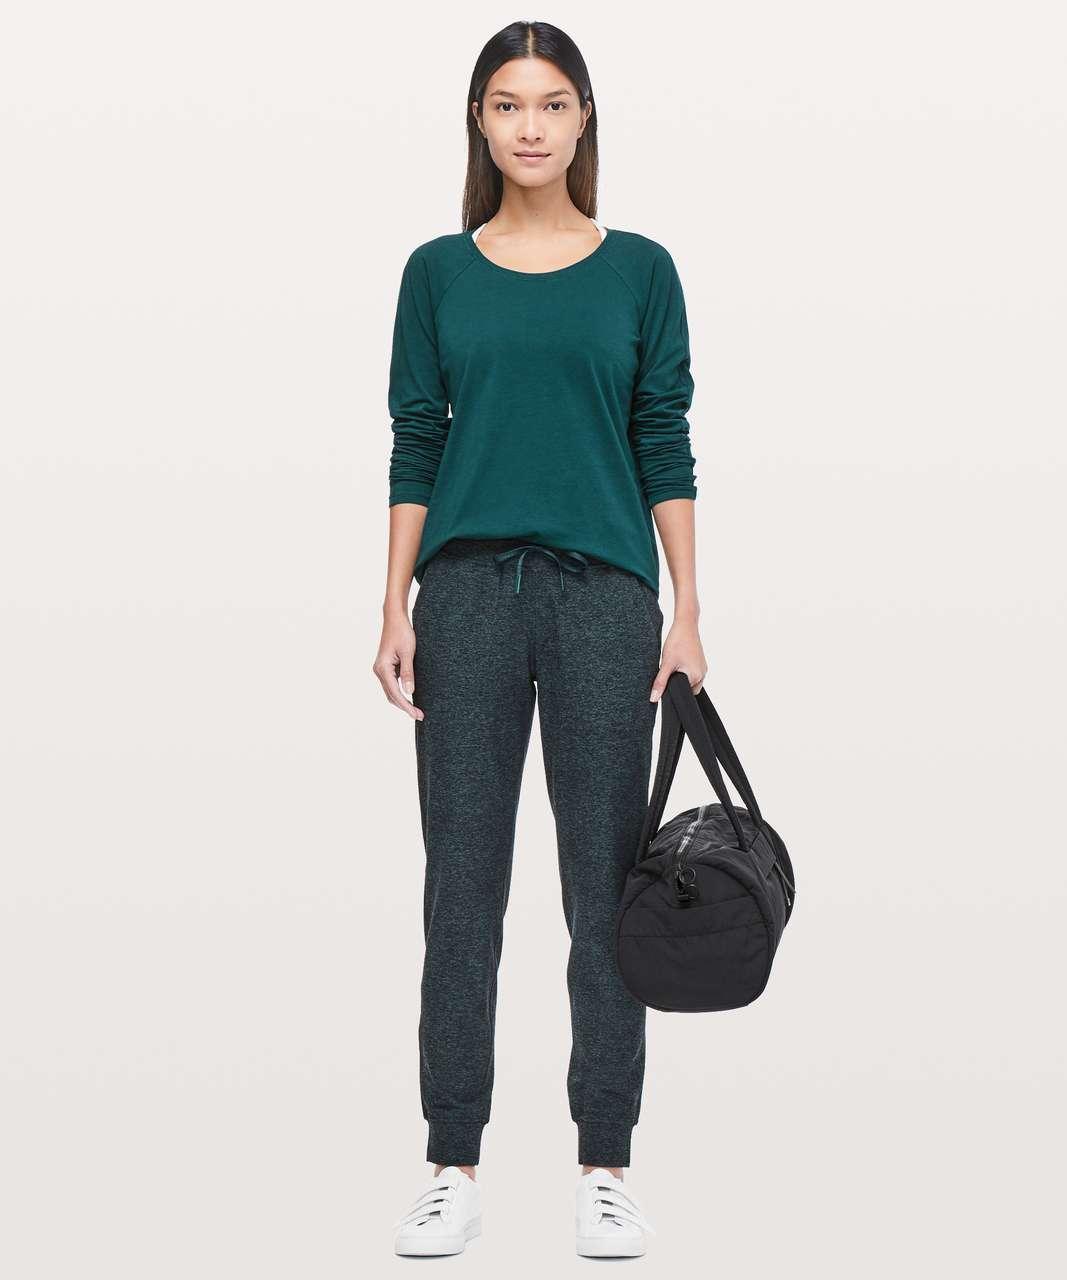 Lululemon Emerald Long Sleeve - Royal Emerald